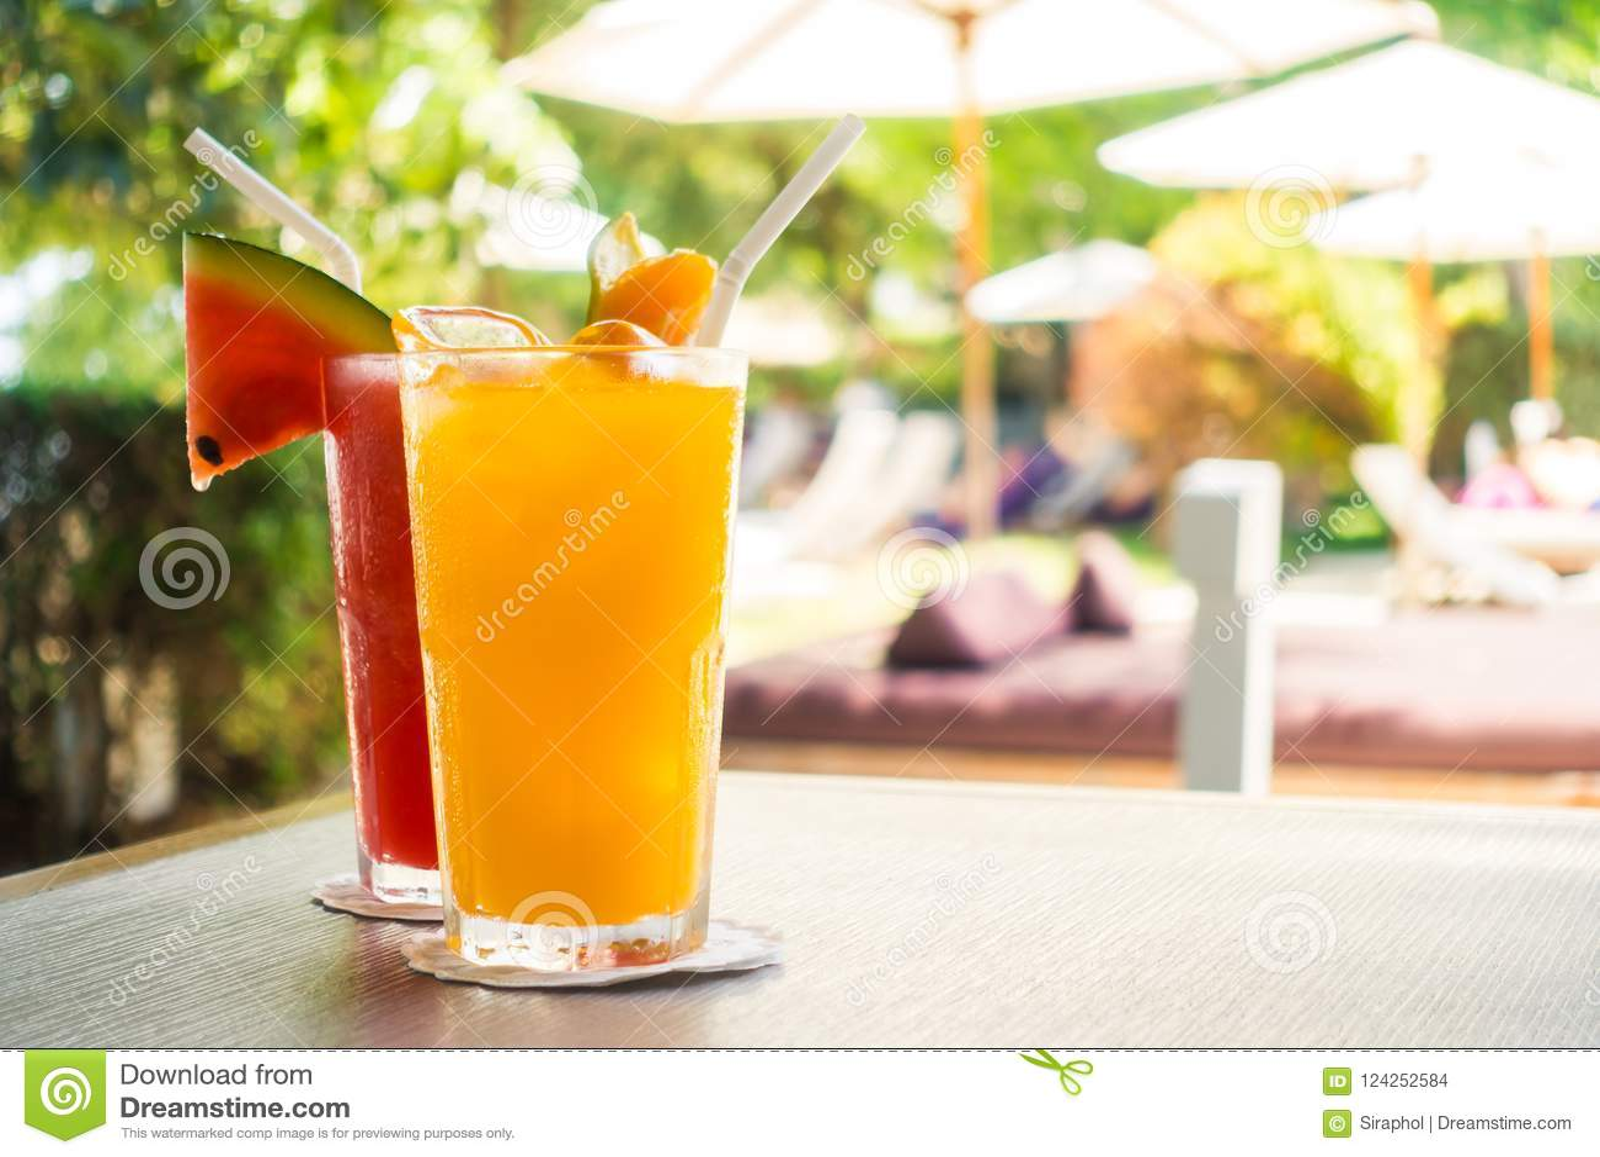 Waterlemon and orange juice in drinking glass